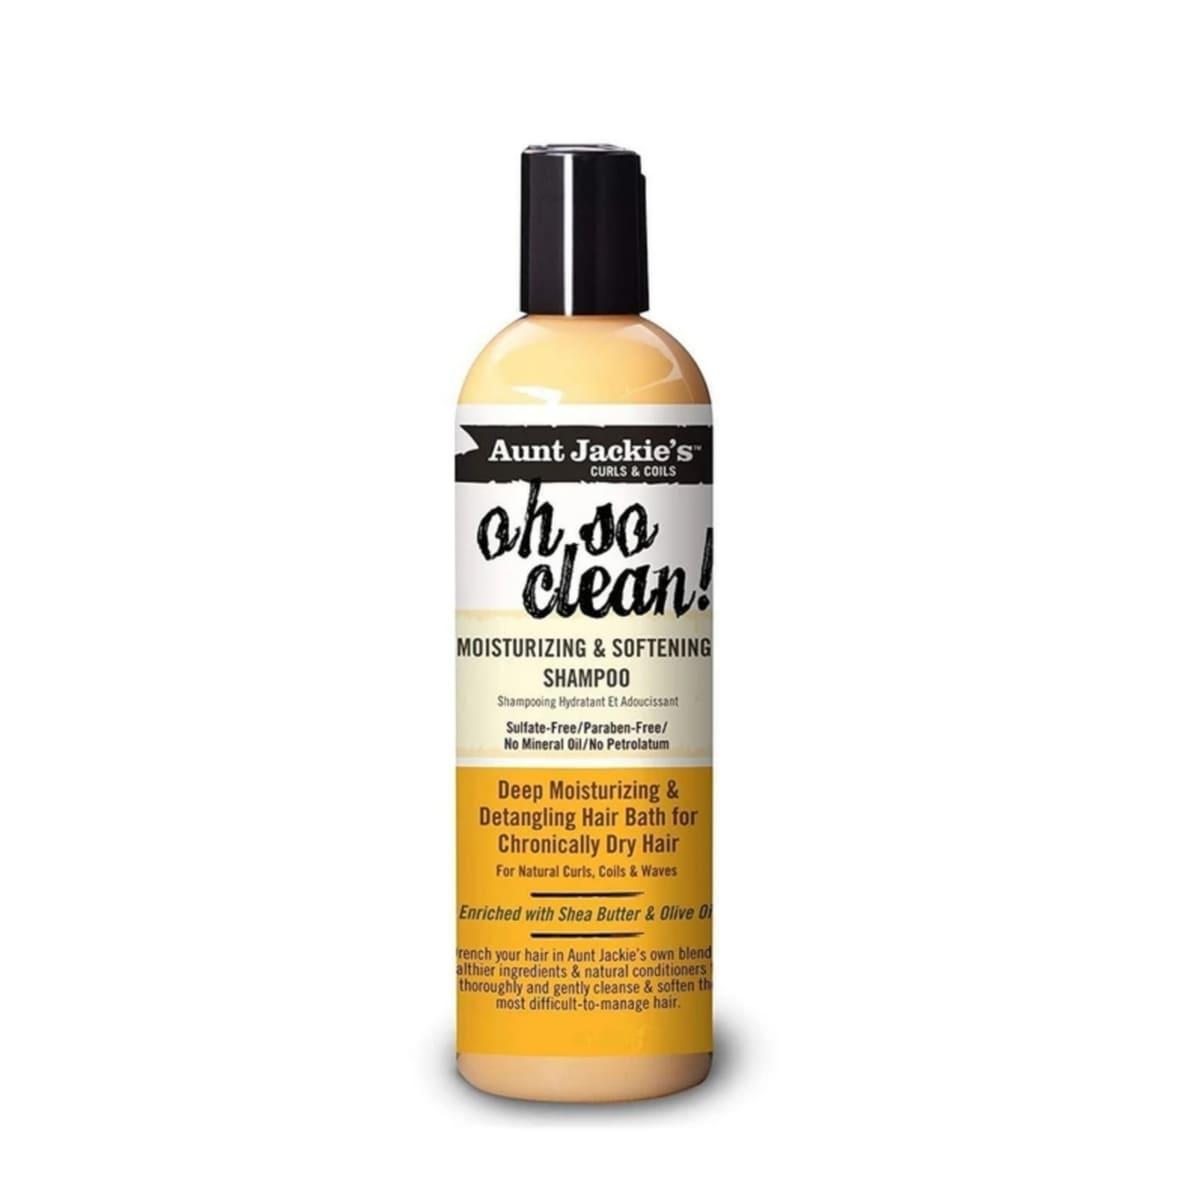 comprar-cosmetico-vegano-champu-oh-so-clean-auntjackies-metodo-curly-trenzas-crochet-pelucas-www.muerebella.com